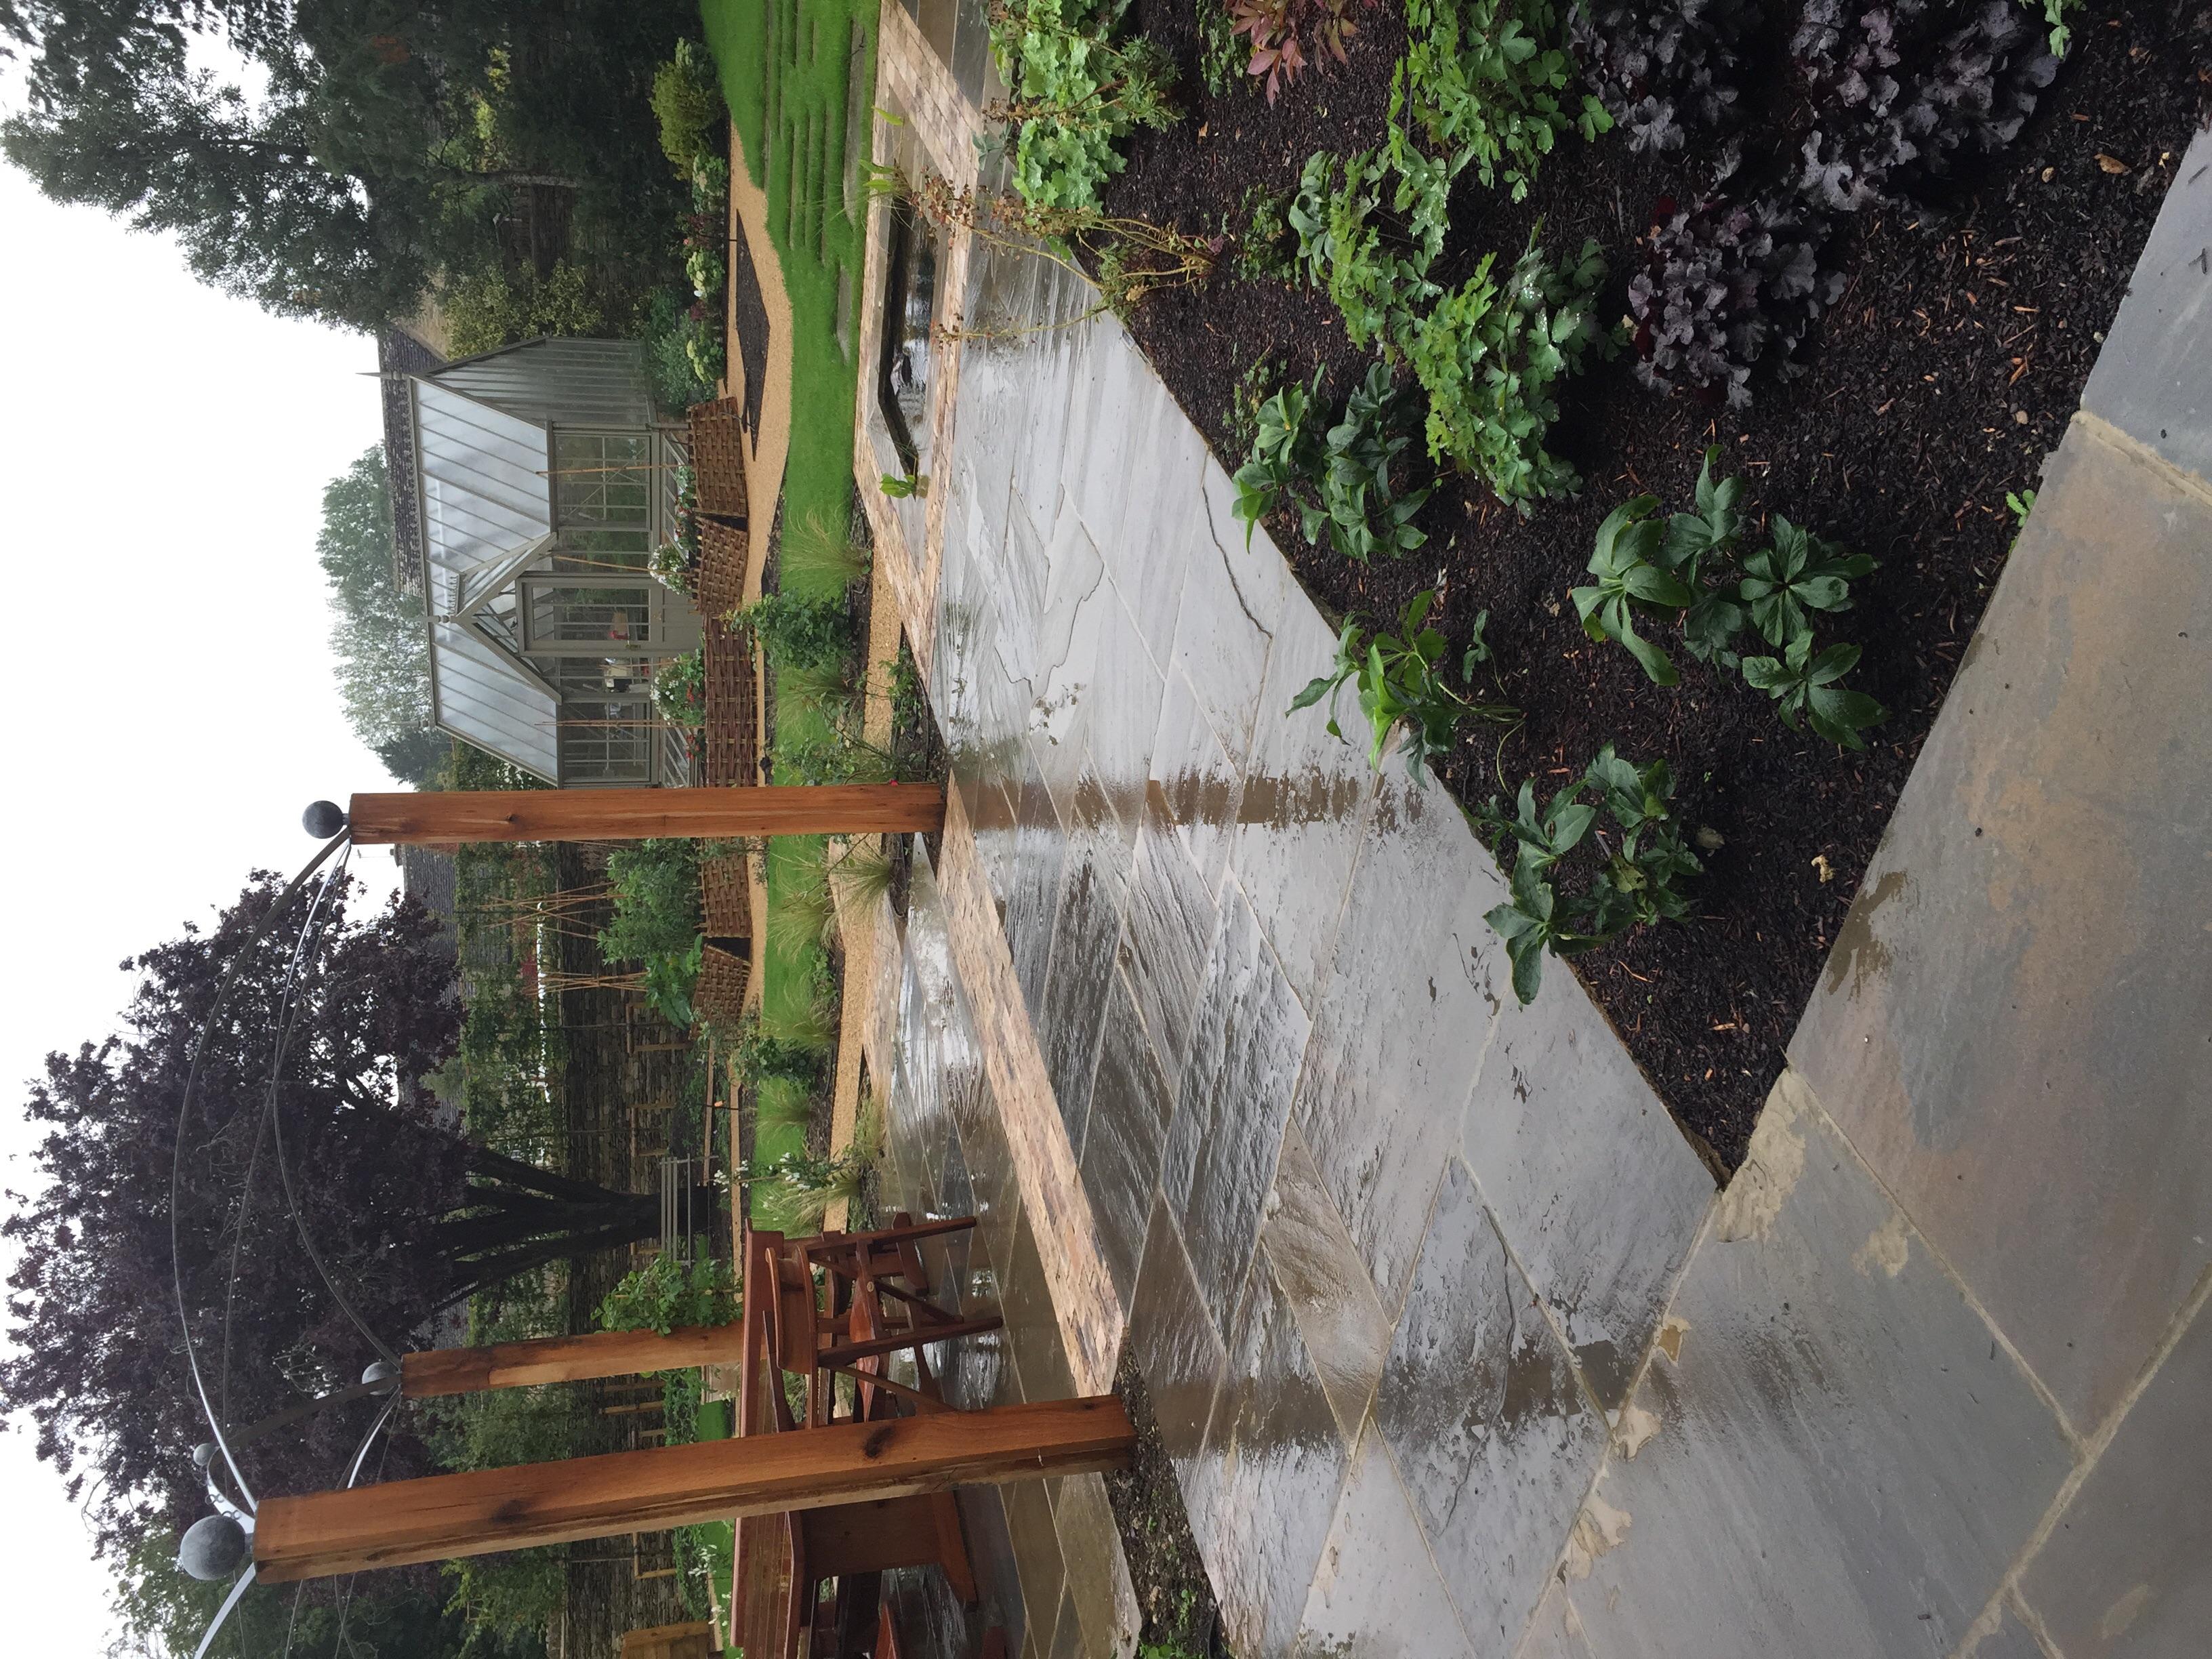 Back garden in the rain